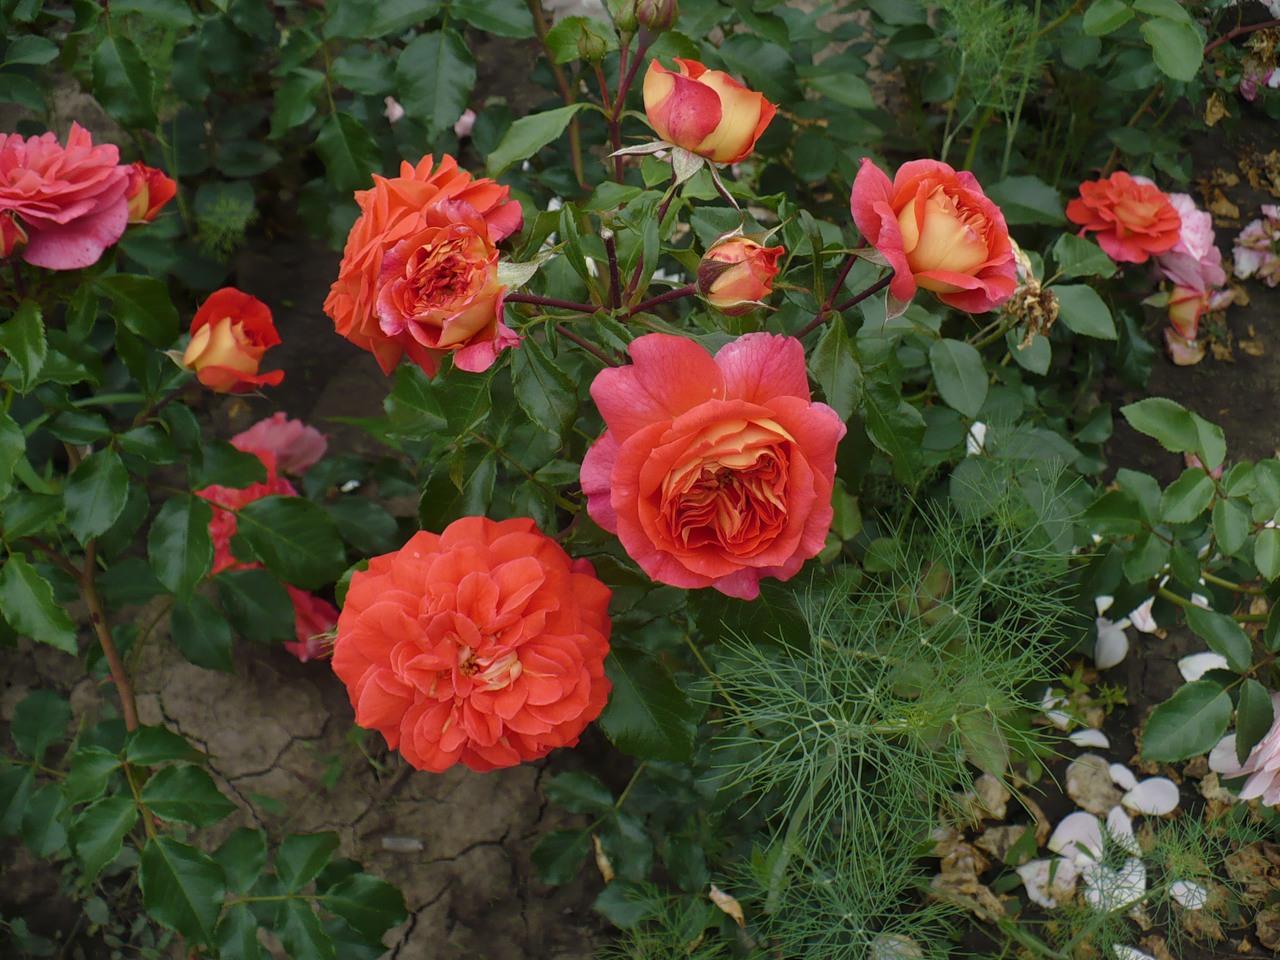 Gerbruder Grimm (Братья Гримм) - розы флорибунда.